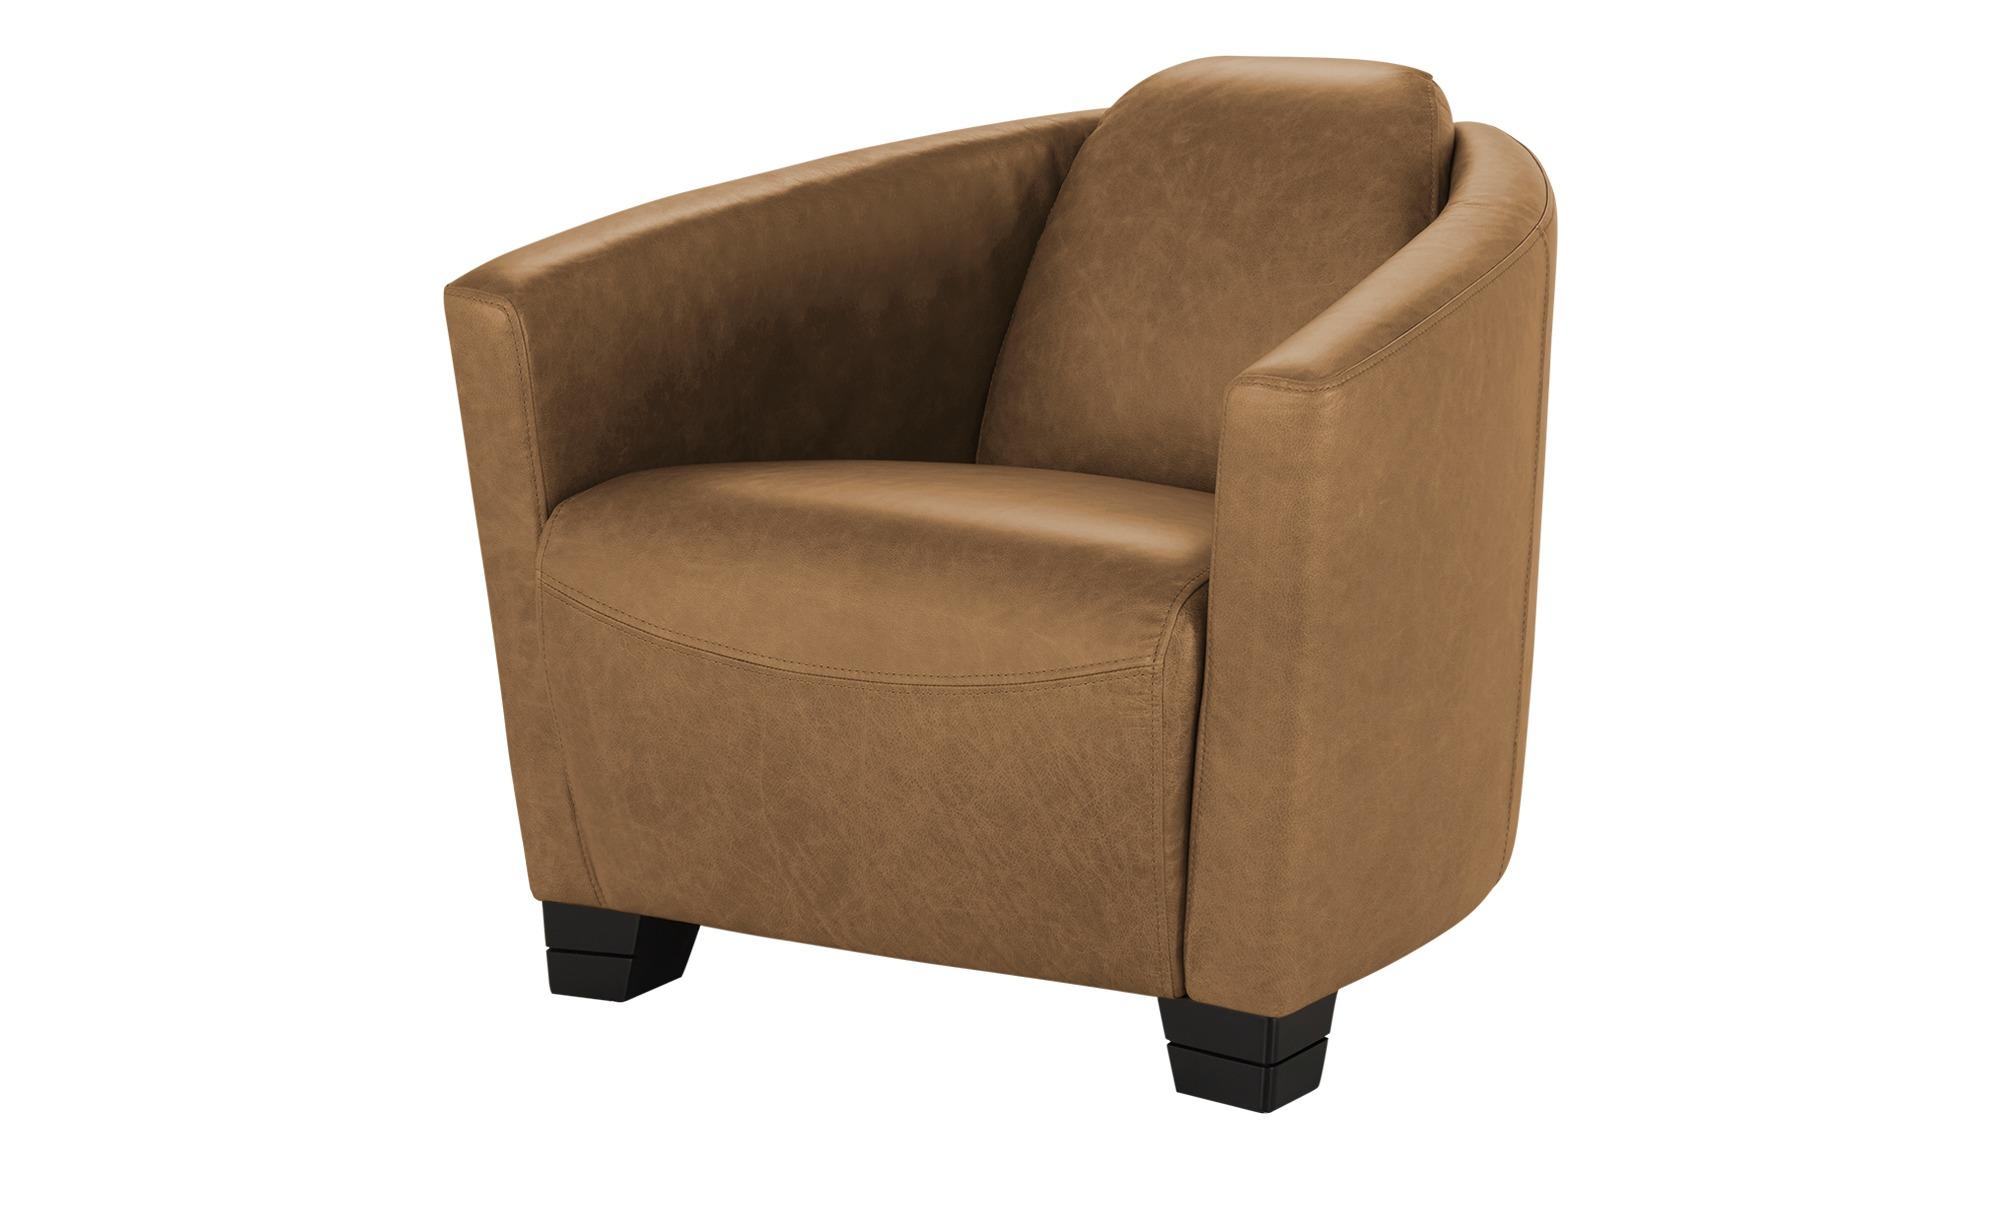 uno Ledersessel  Taylor ¦ braun ¦ Maße (cm): B: 79 H: 73 T: 85 Polstermöbel > Sessel > Ledersessel - Höffner